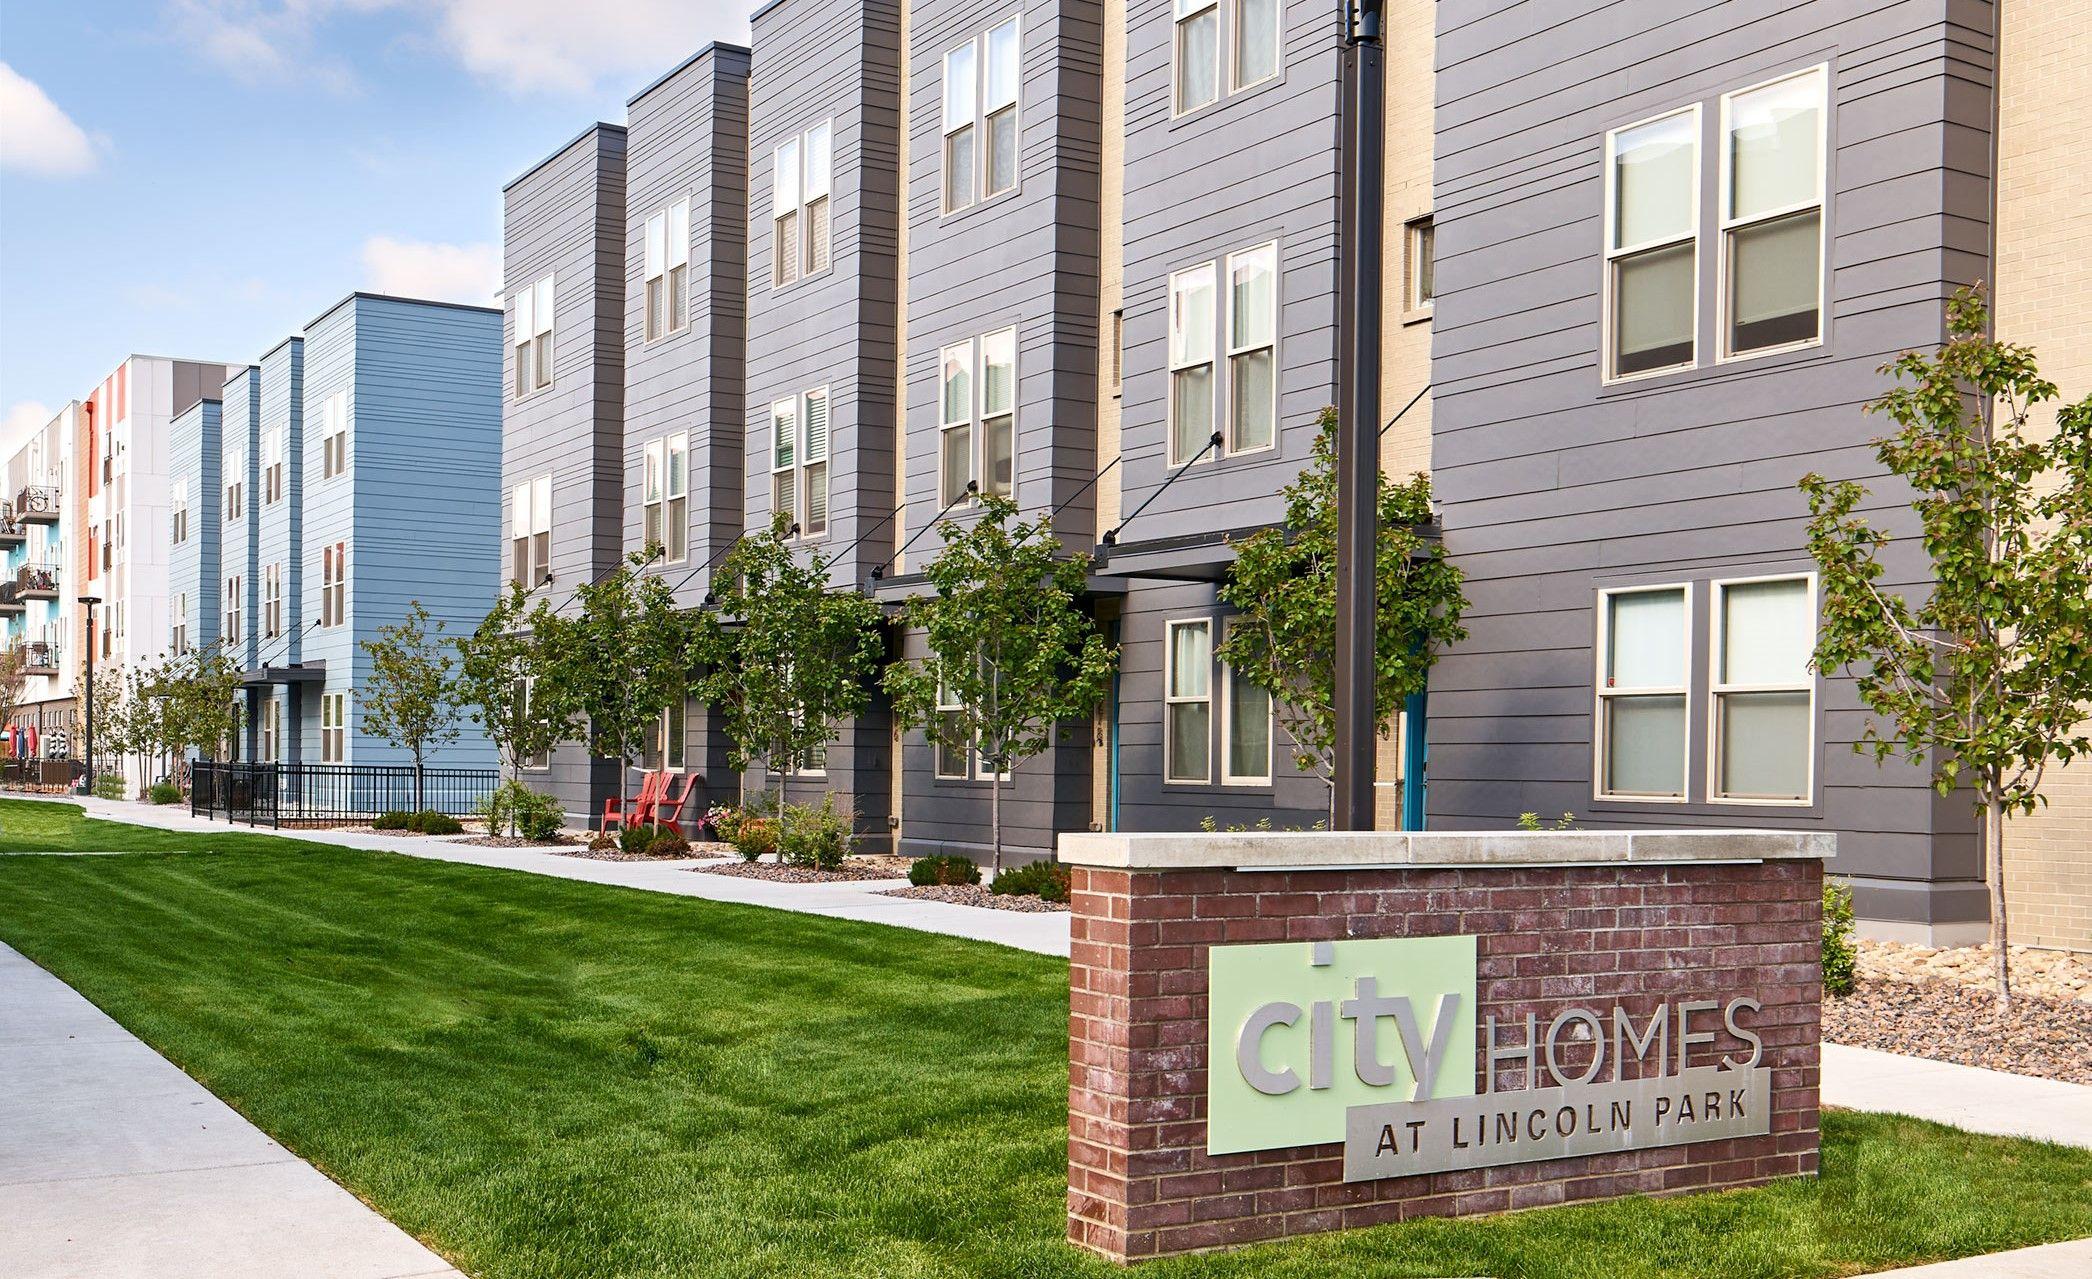 'CityHomes at Lincoln Park' by Koelbel Urban Homes in Denver